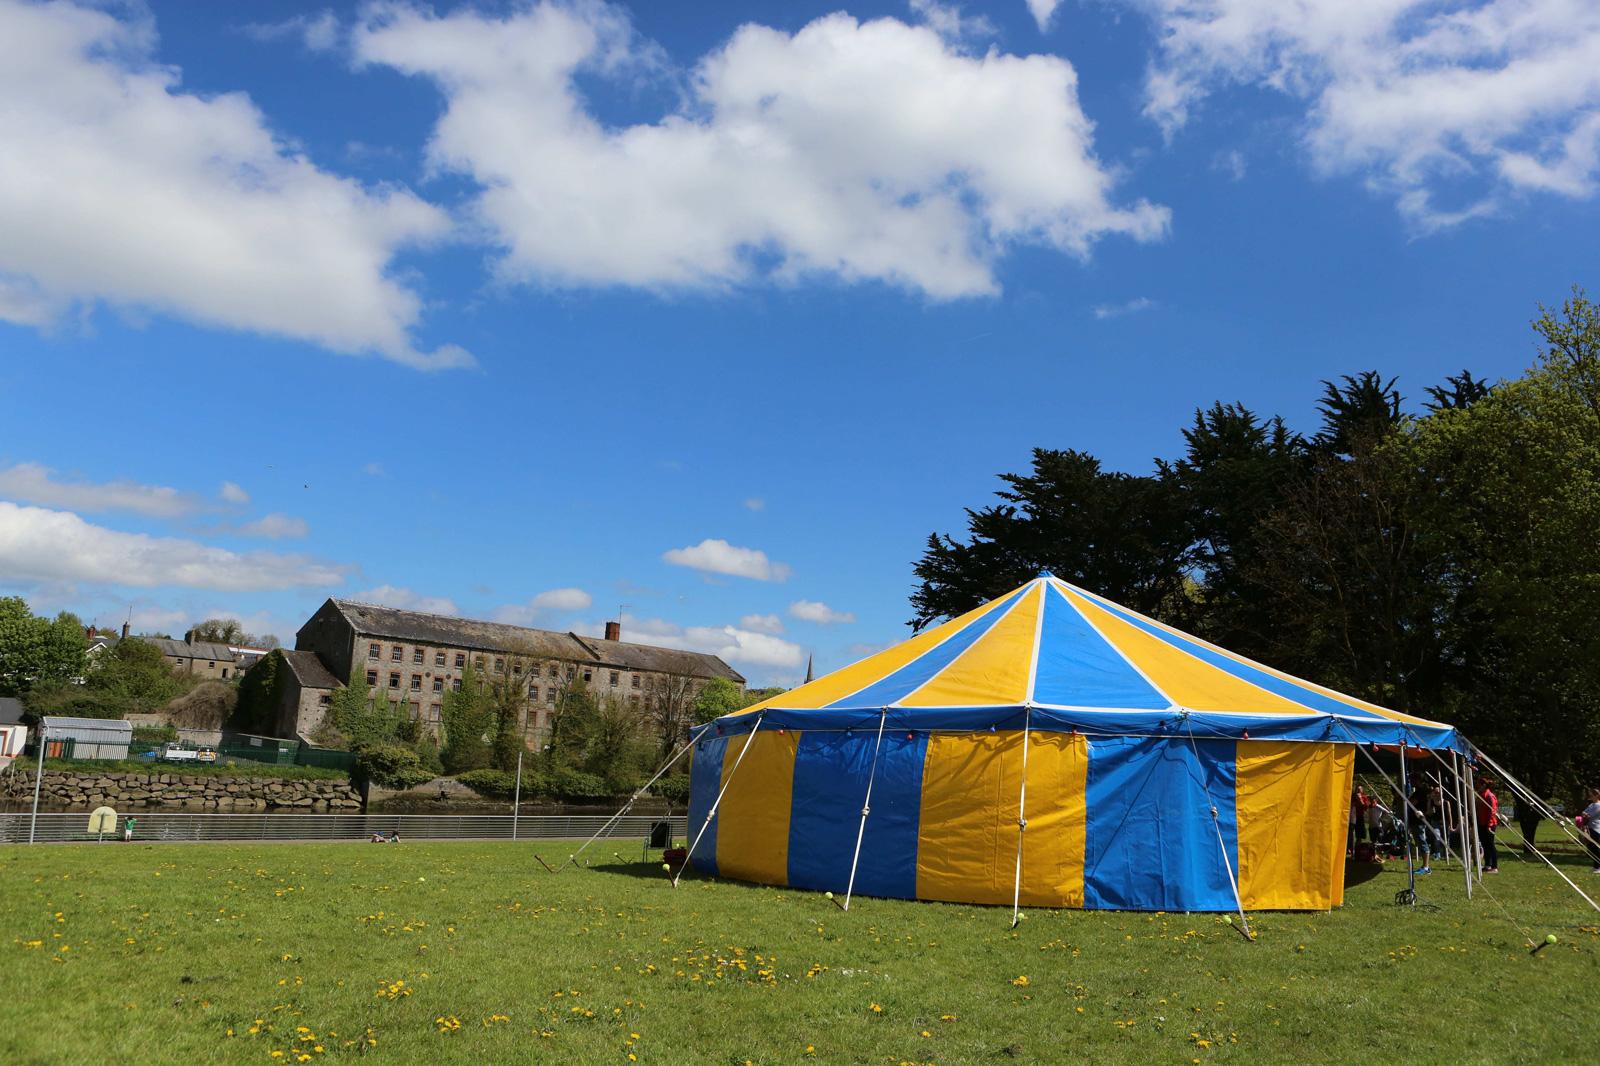 Drogheda Arts Festival, Jenny Callanan Photography, Drogheda, Co.Louth